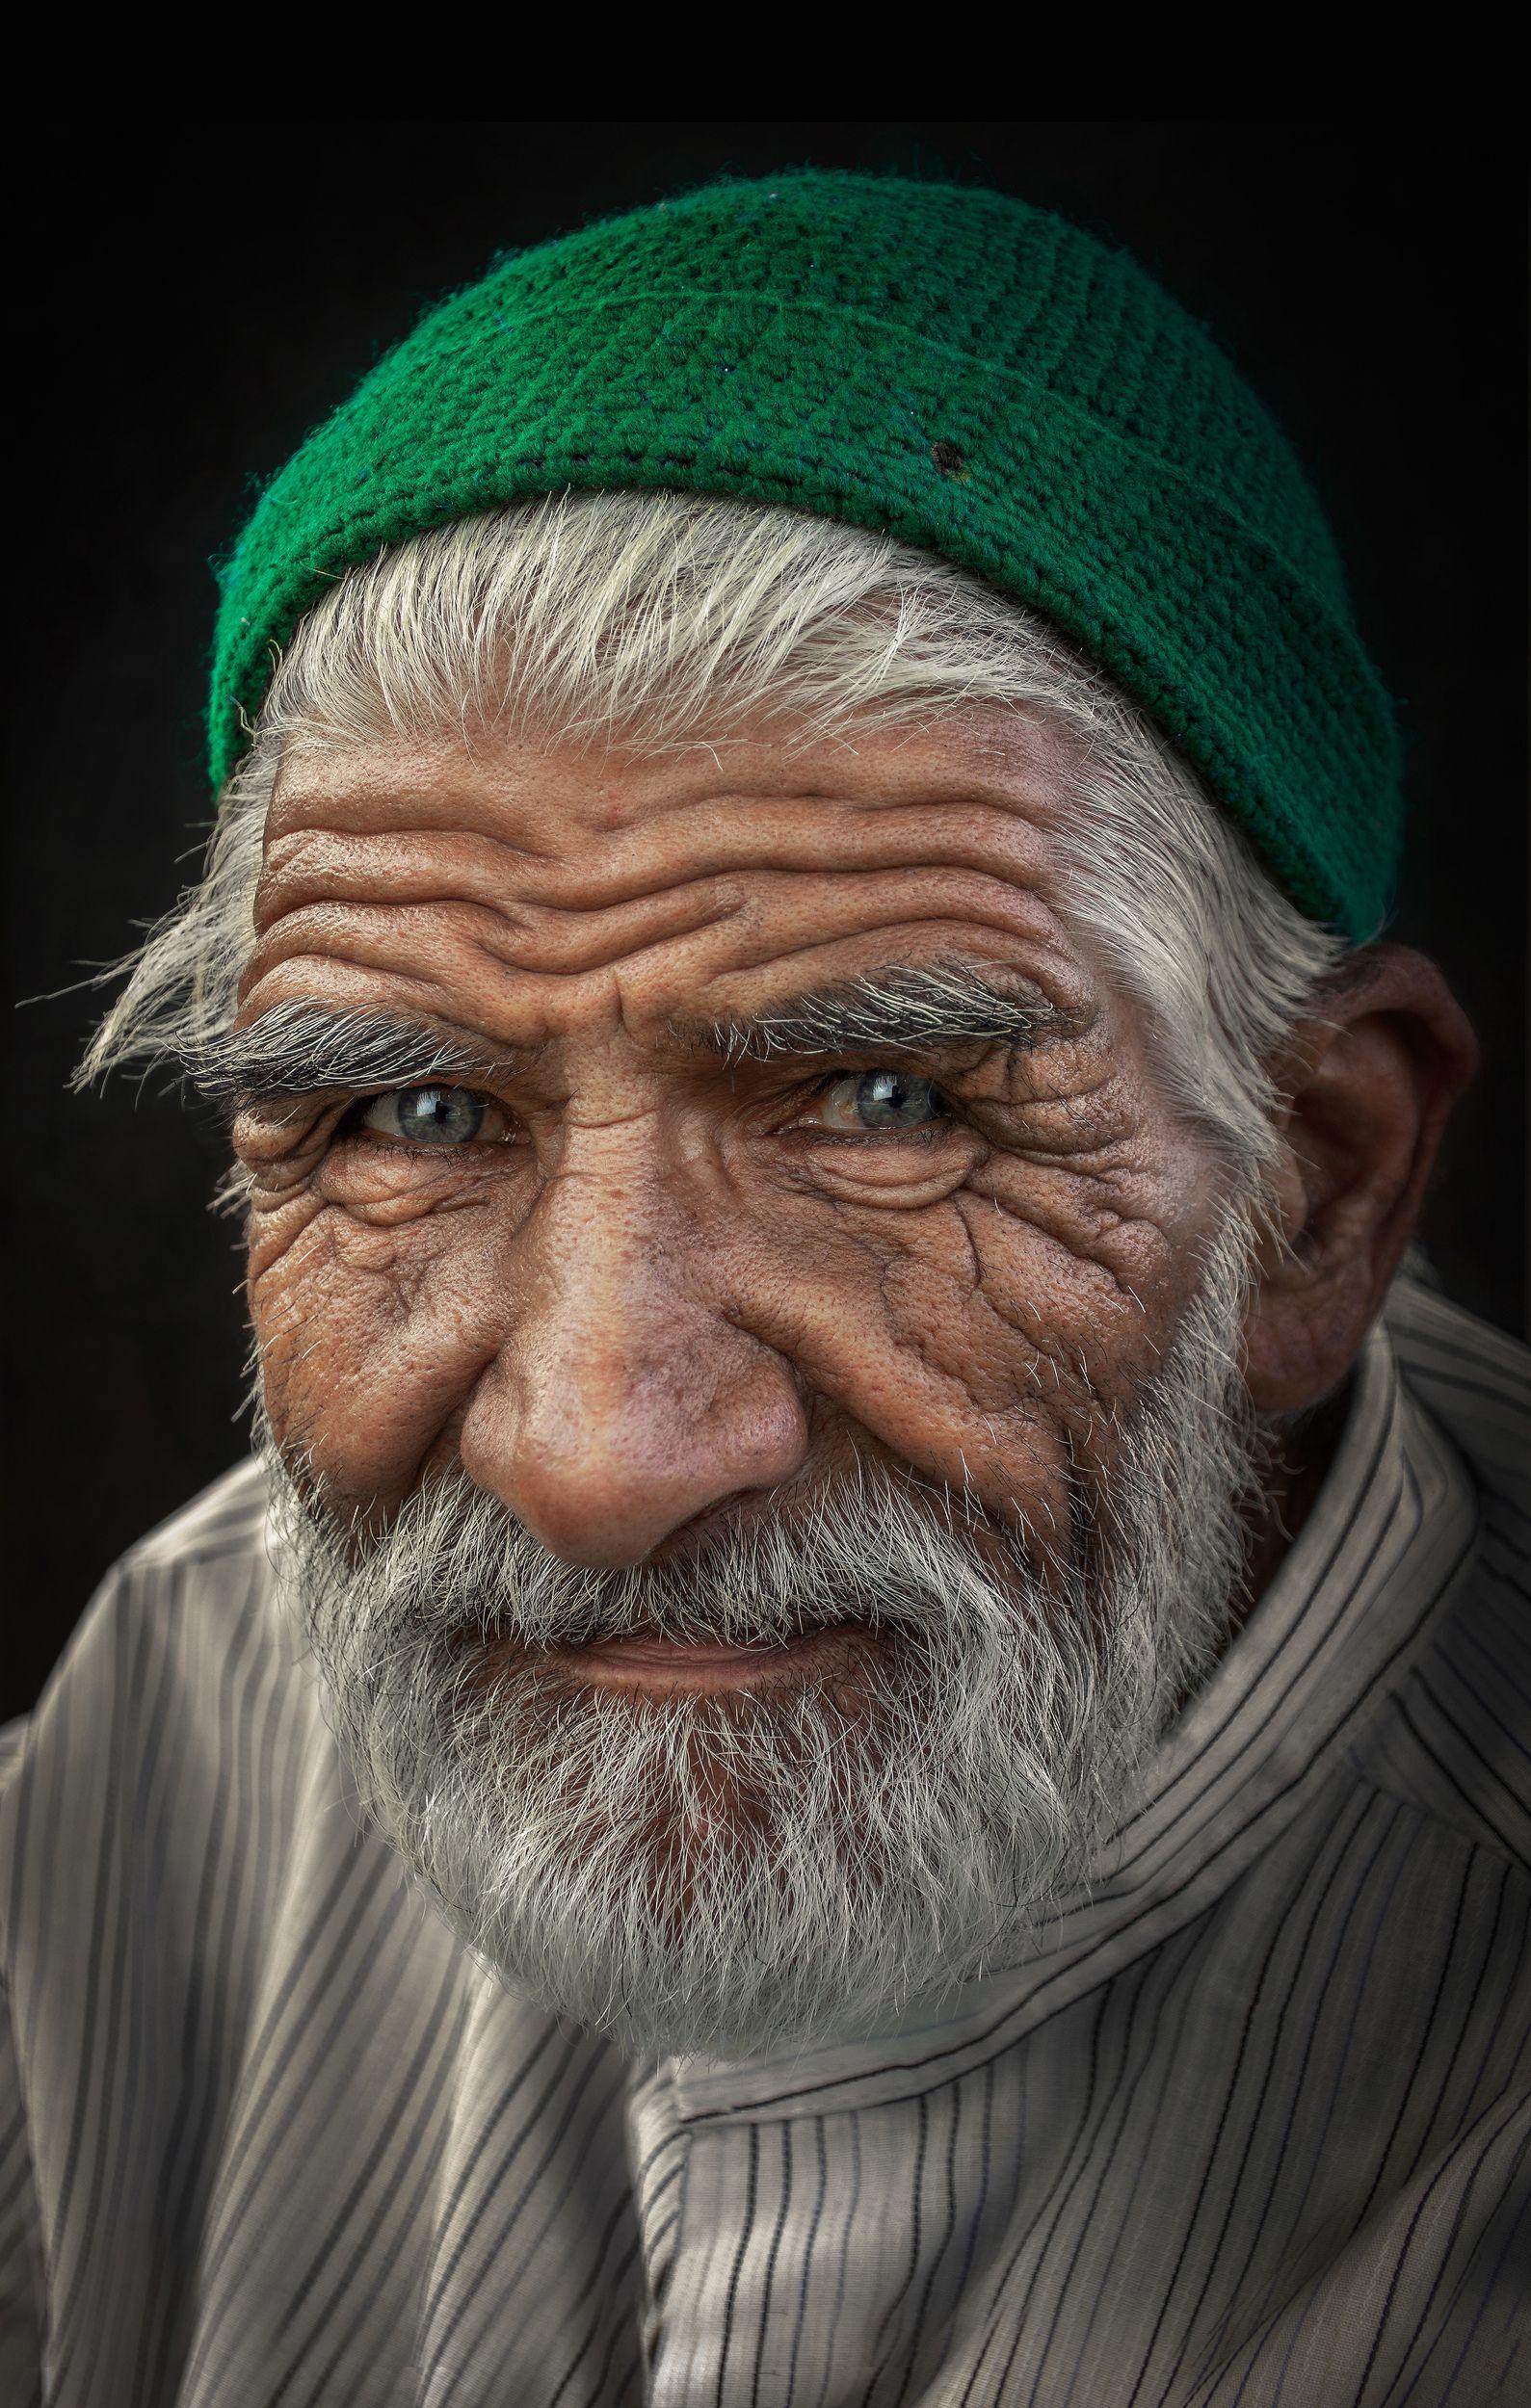 #clothing #forehead #portrait #people, Zavvar Mehdi